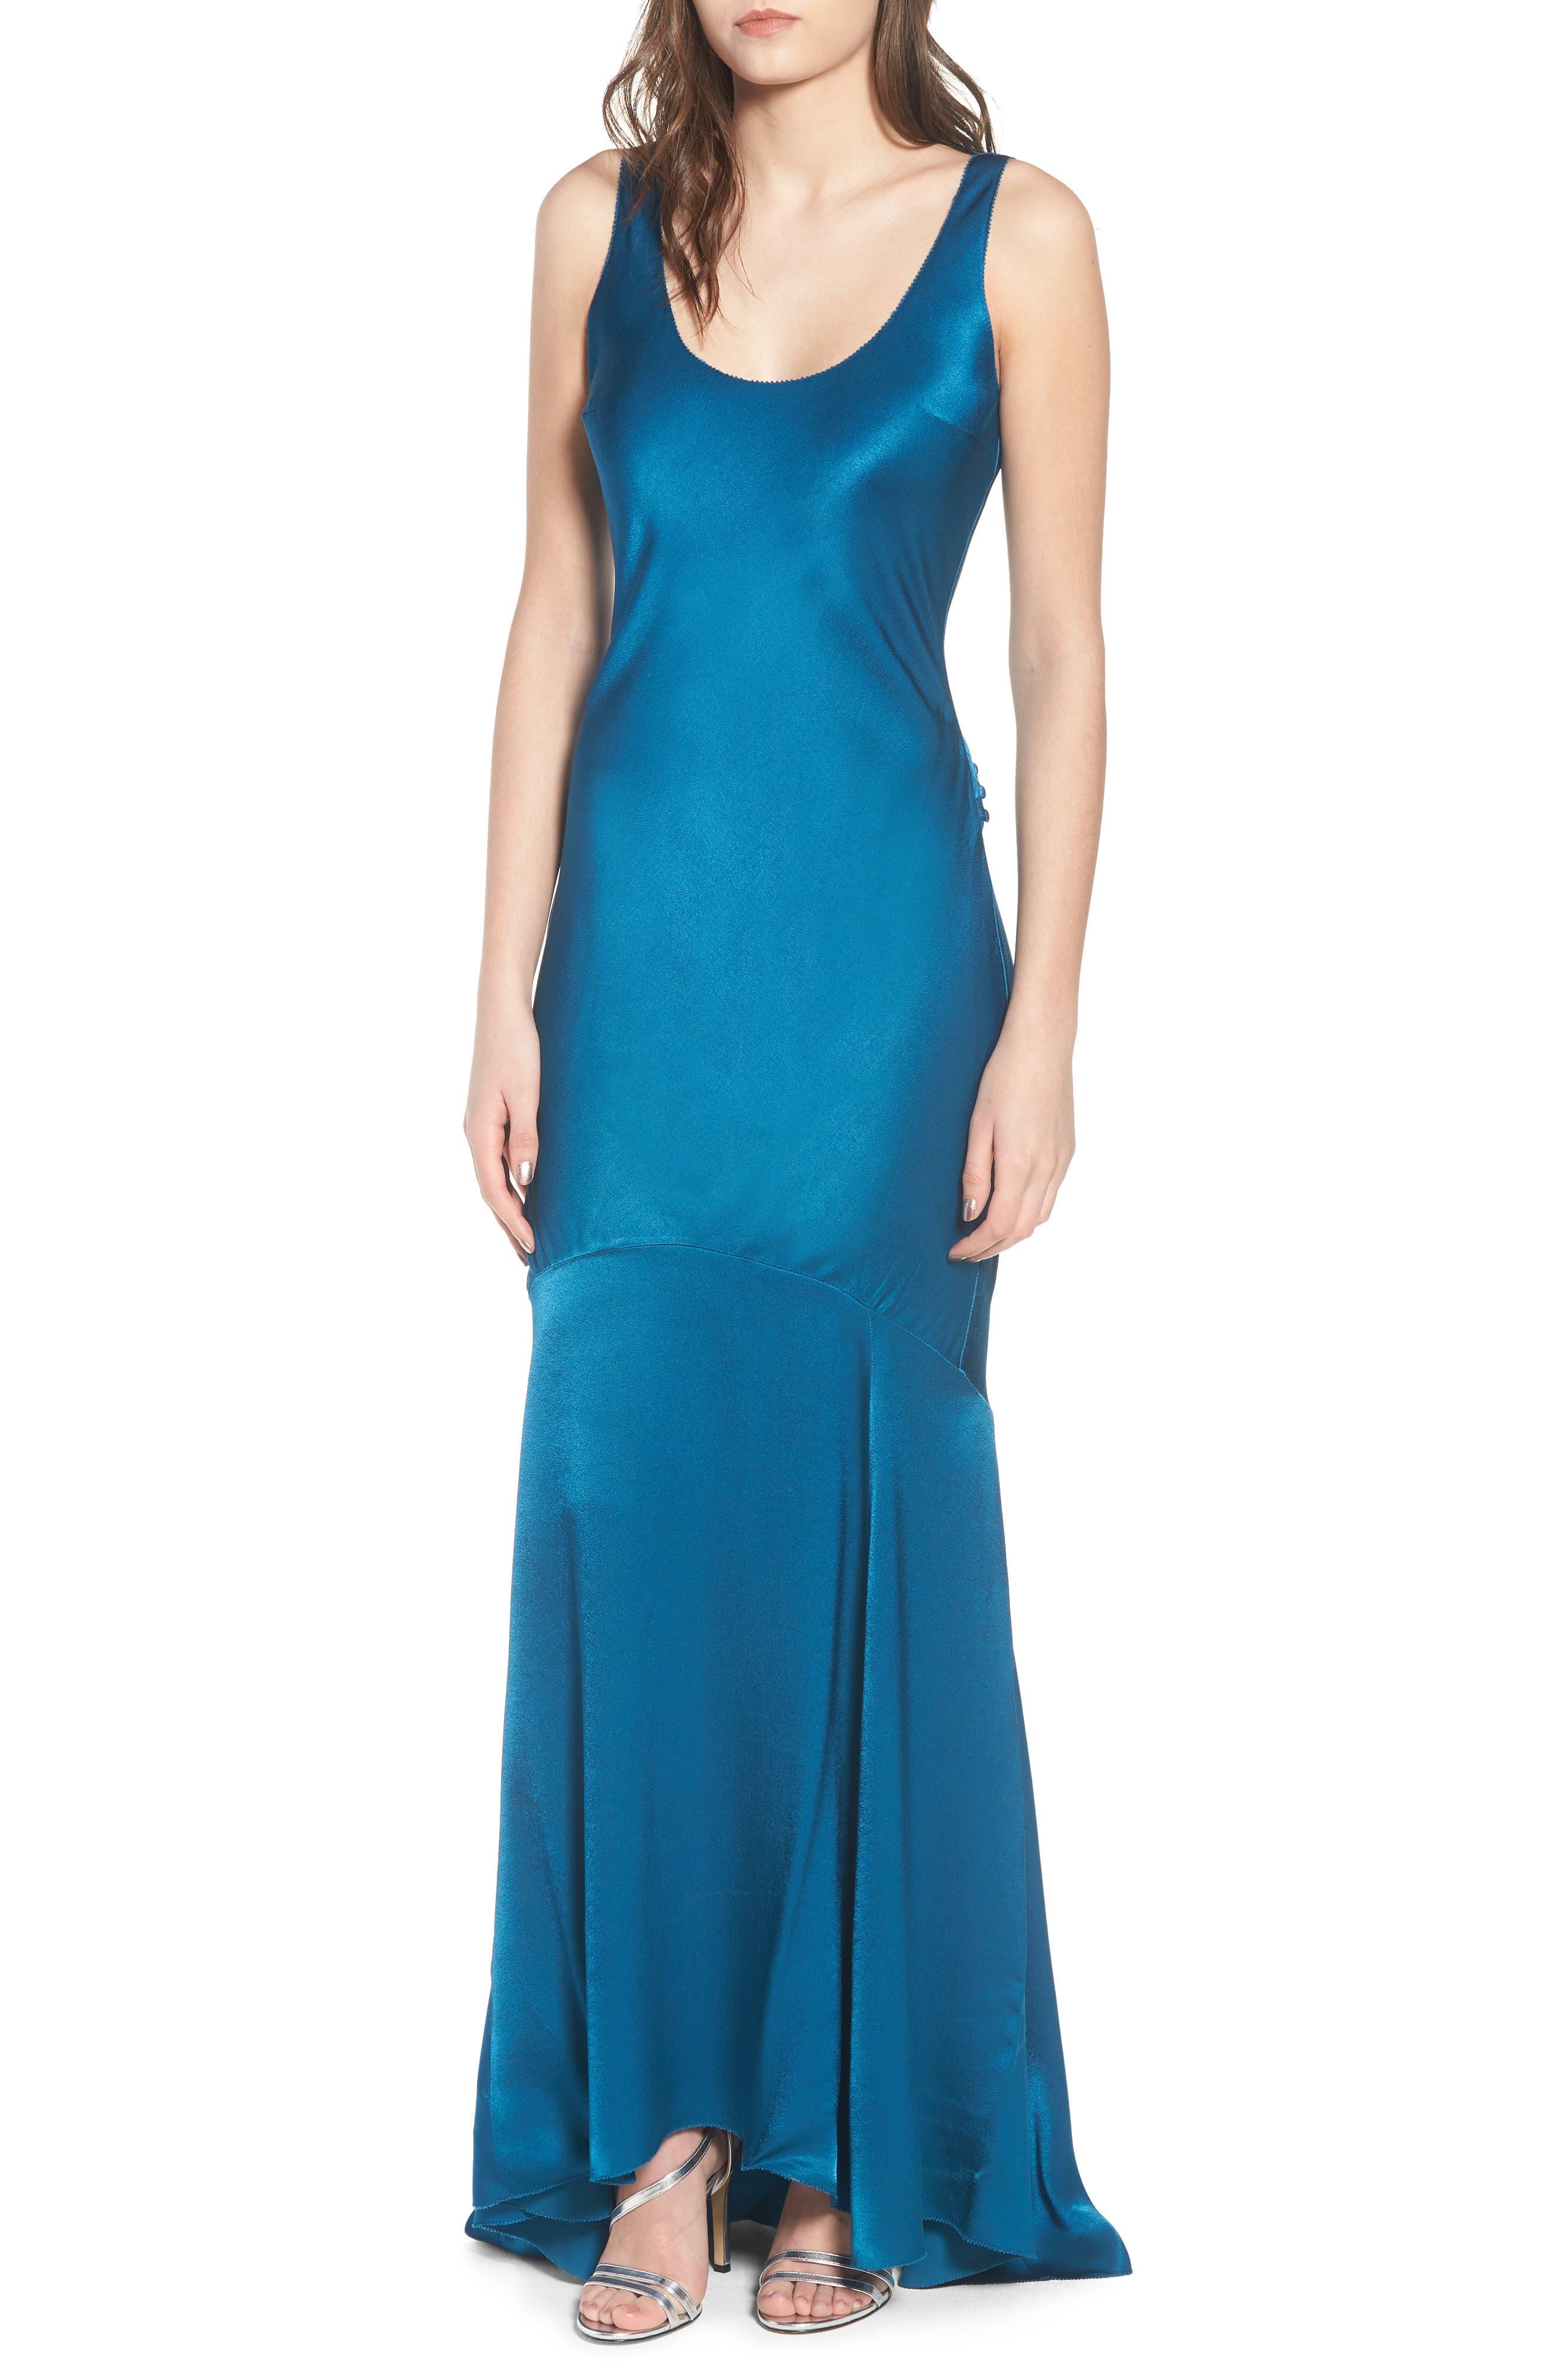 Blue Satin Dresses